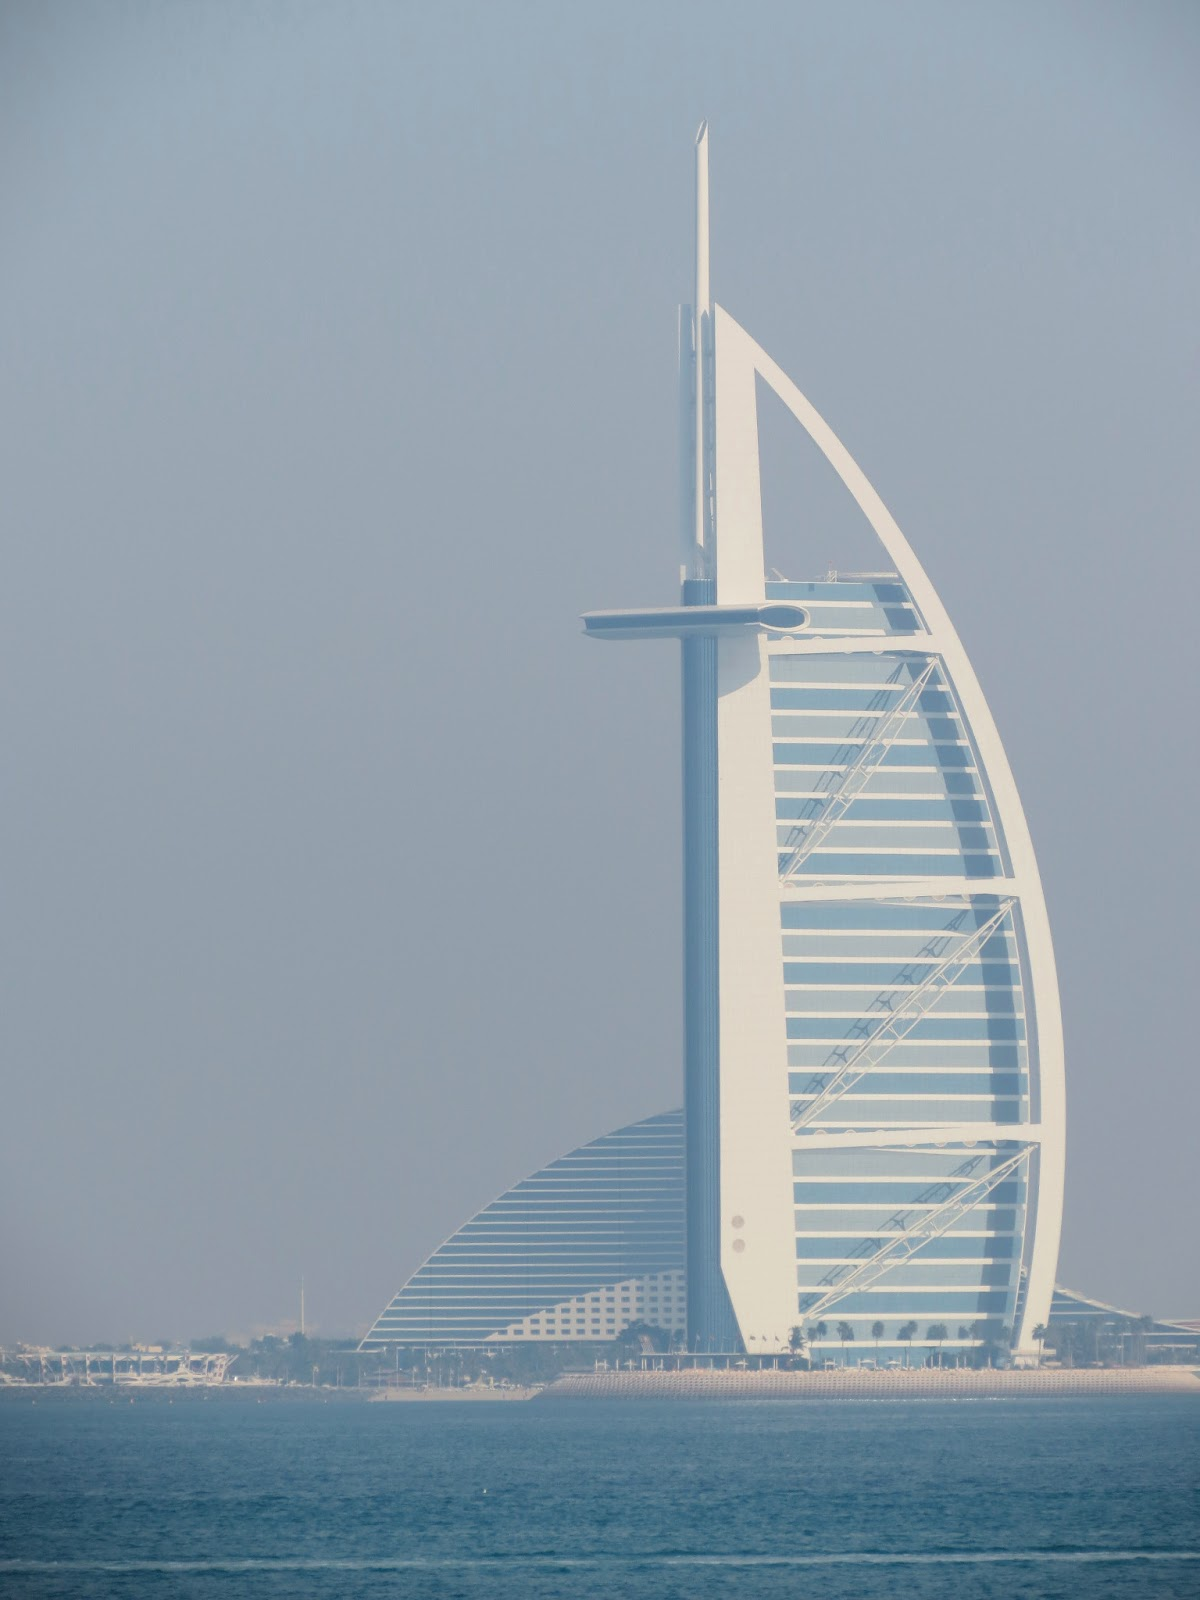 Abu dhabi adventures random trip photos for Burj al arab 7 star